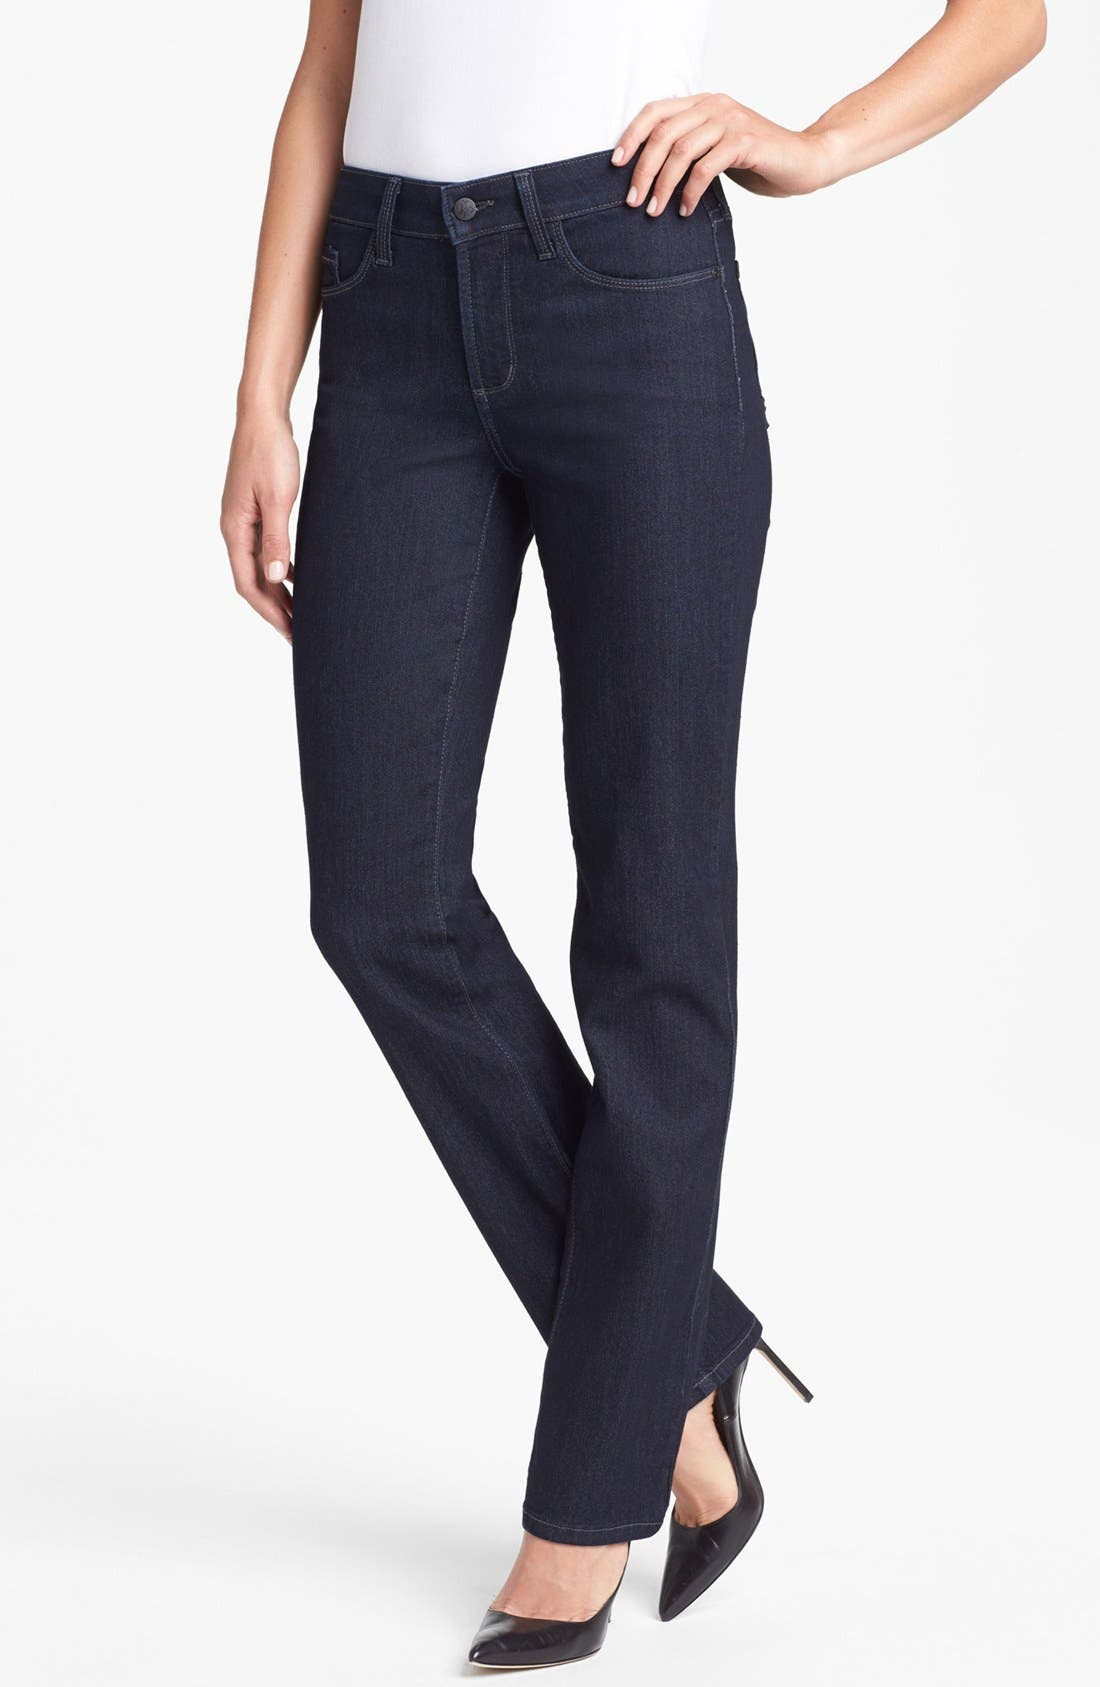 Main Image - NYDJ 'Marilyn' Embellished Pocket Stretch Straight Leg Jeans (Dark Enzyme) (Regular & Petite)